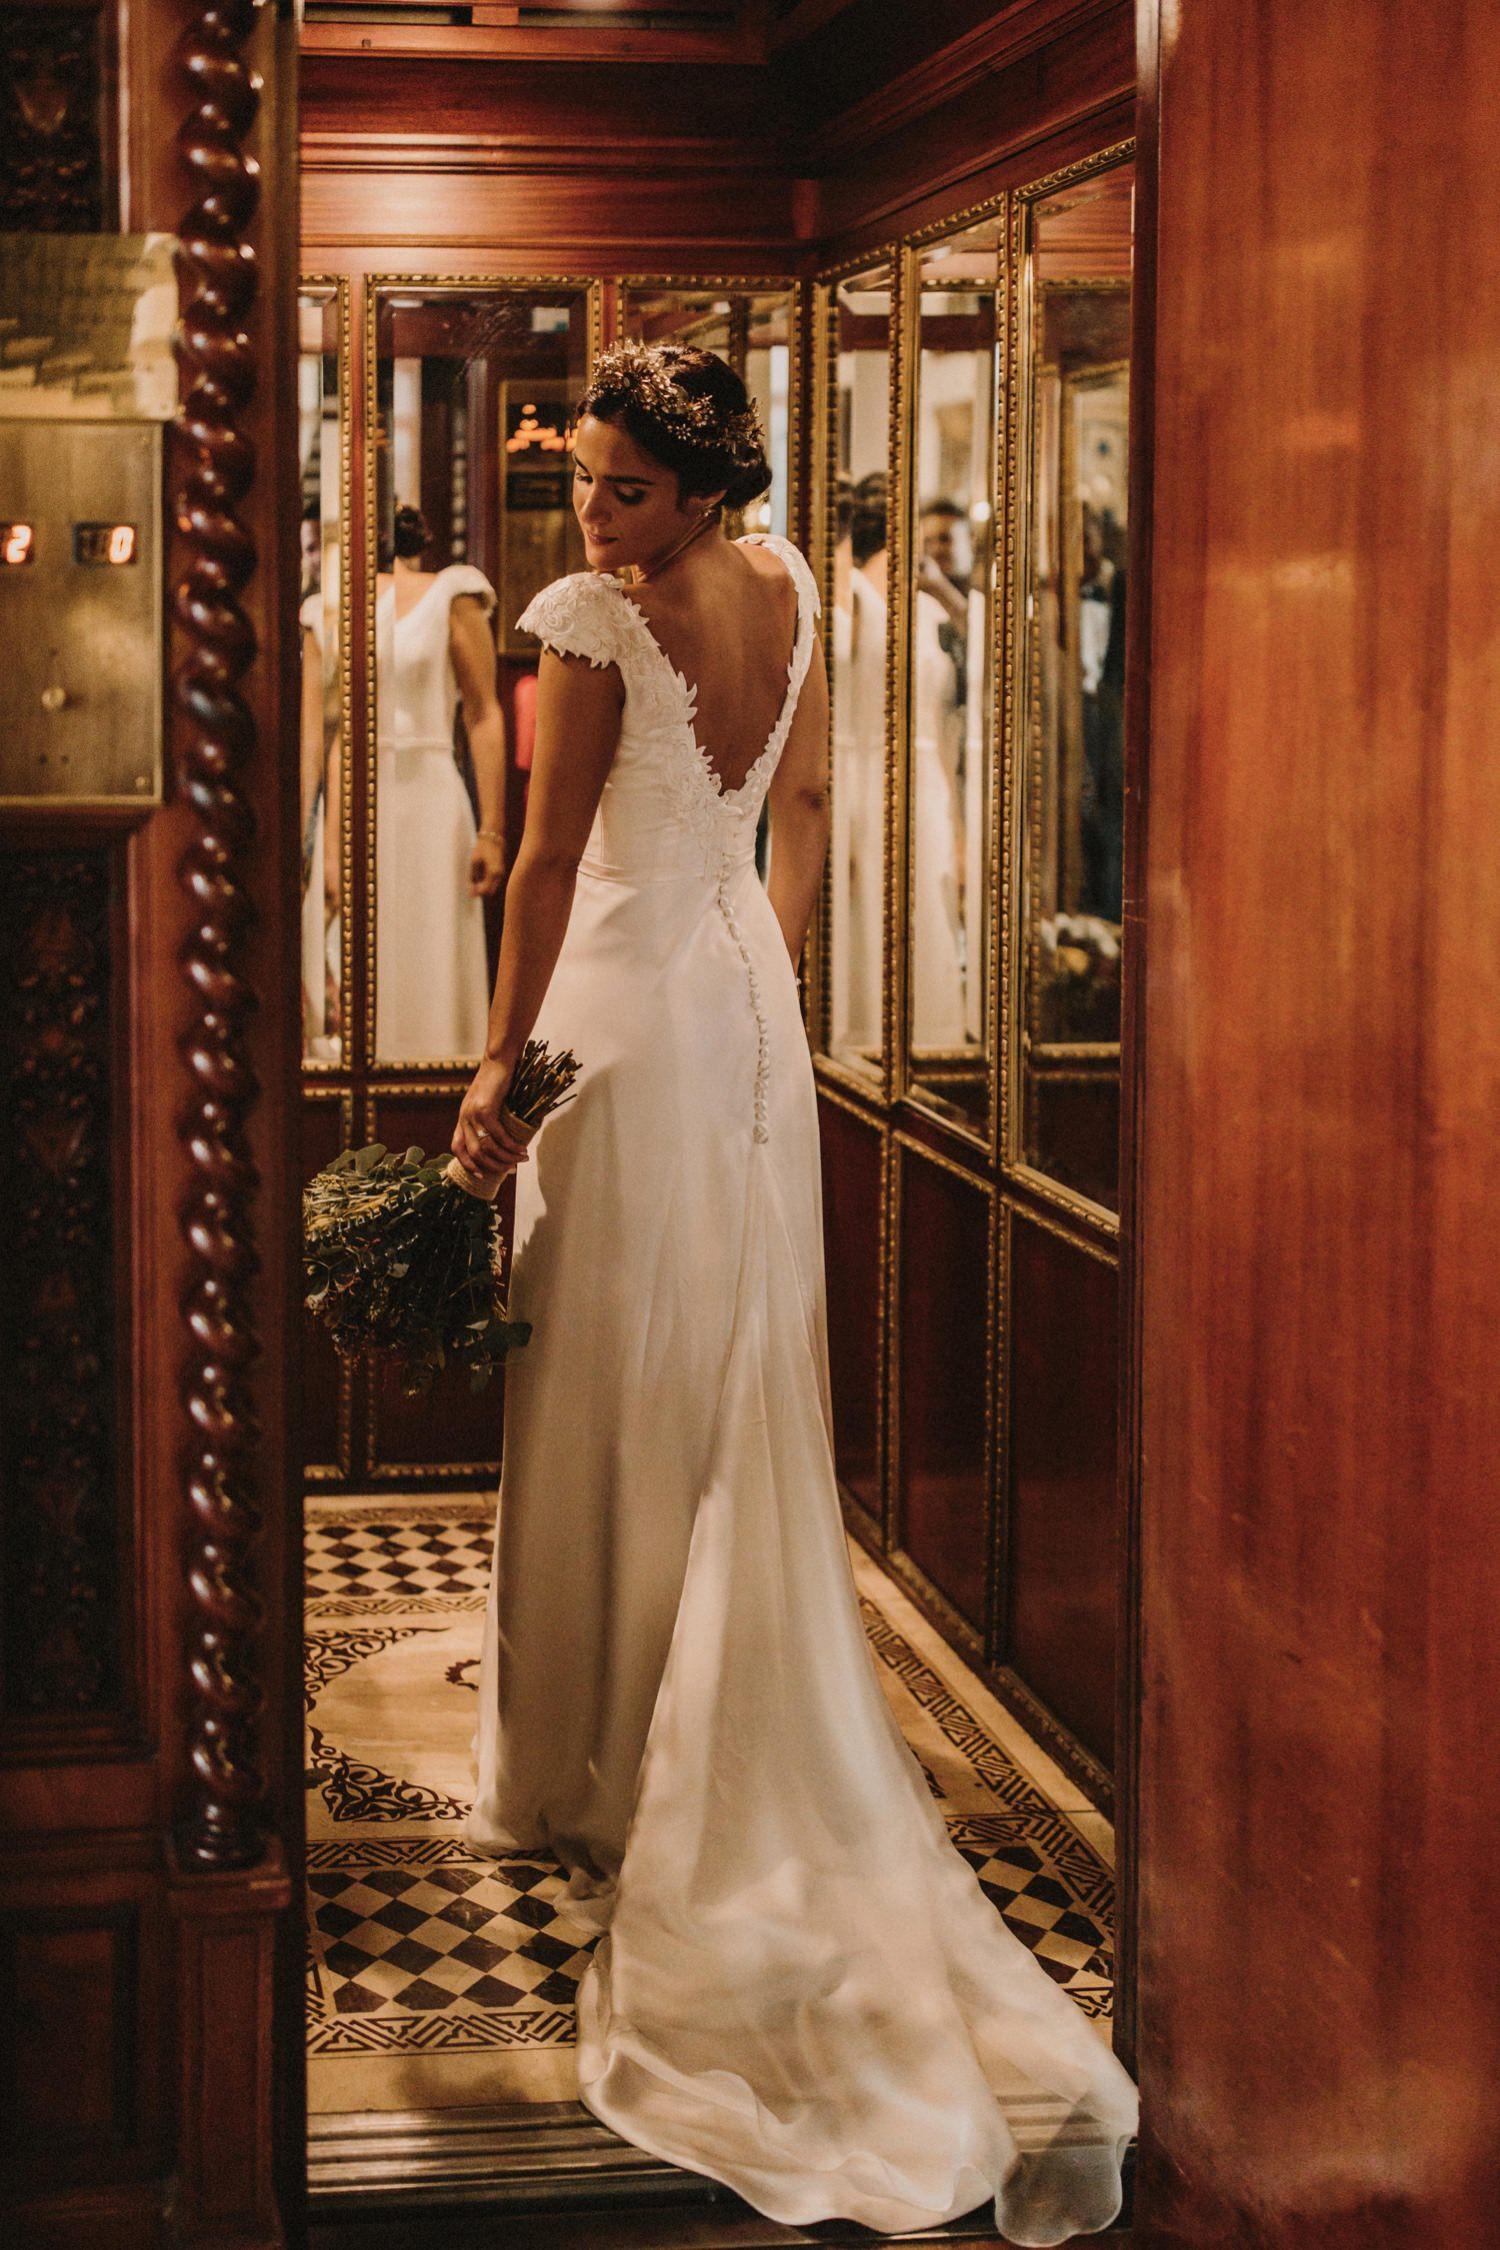 057_wedding-ernestovillalba-maria-daniel-3346-ASE.jpg